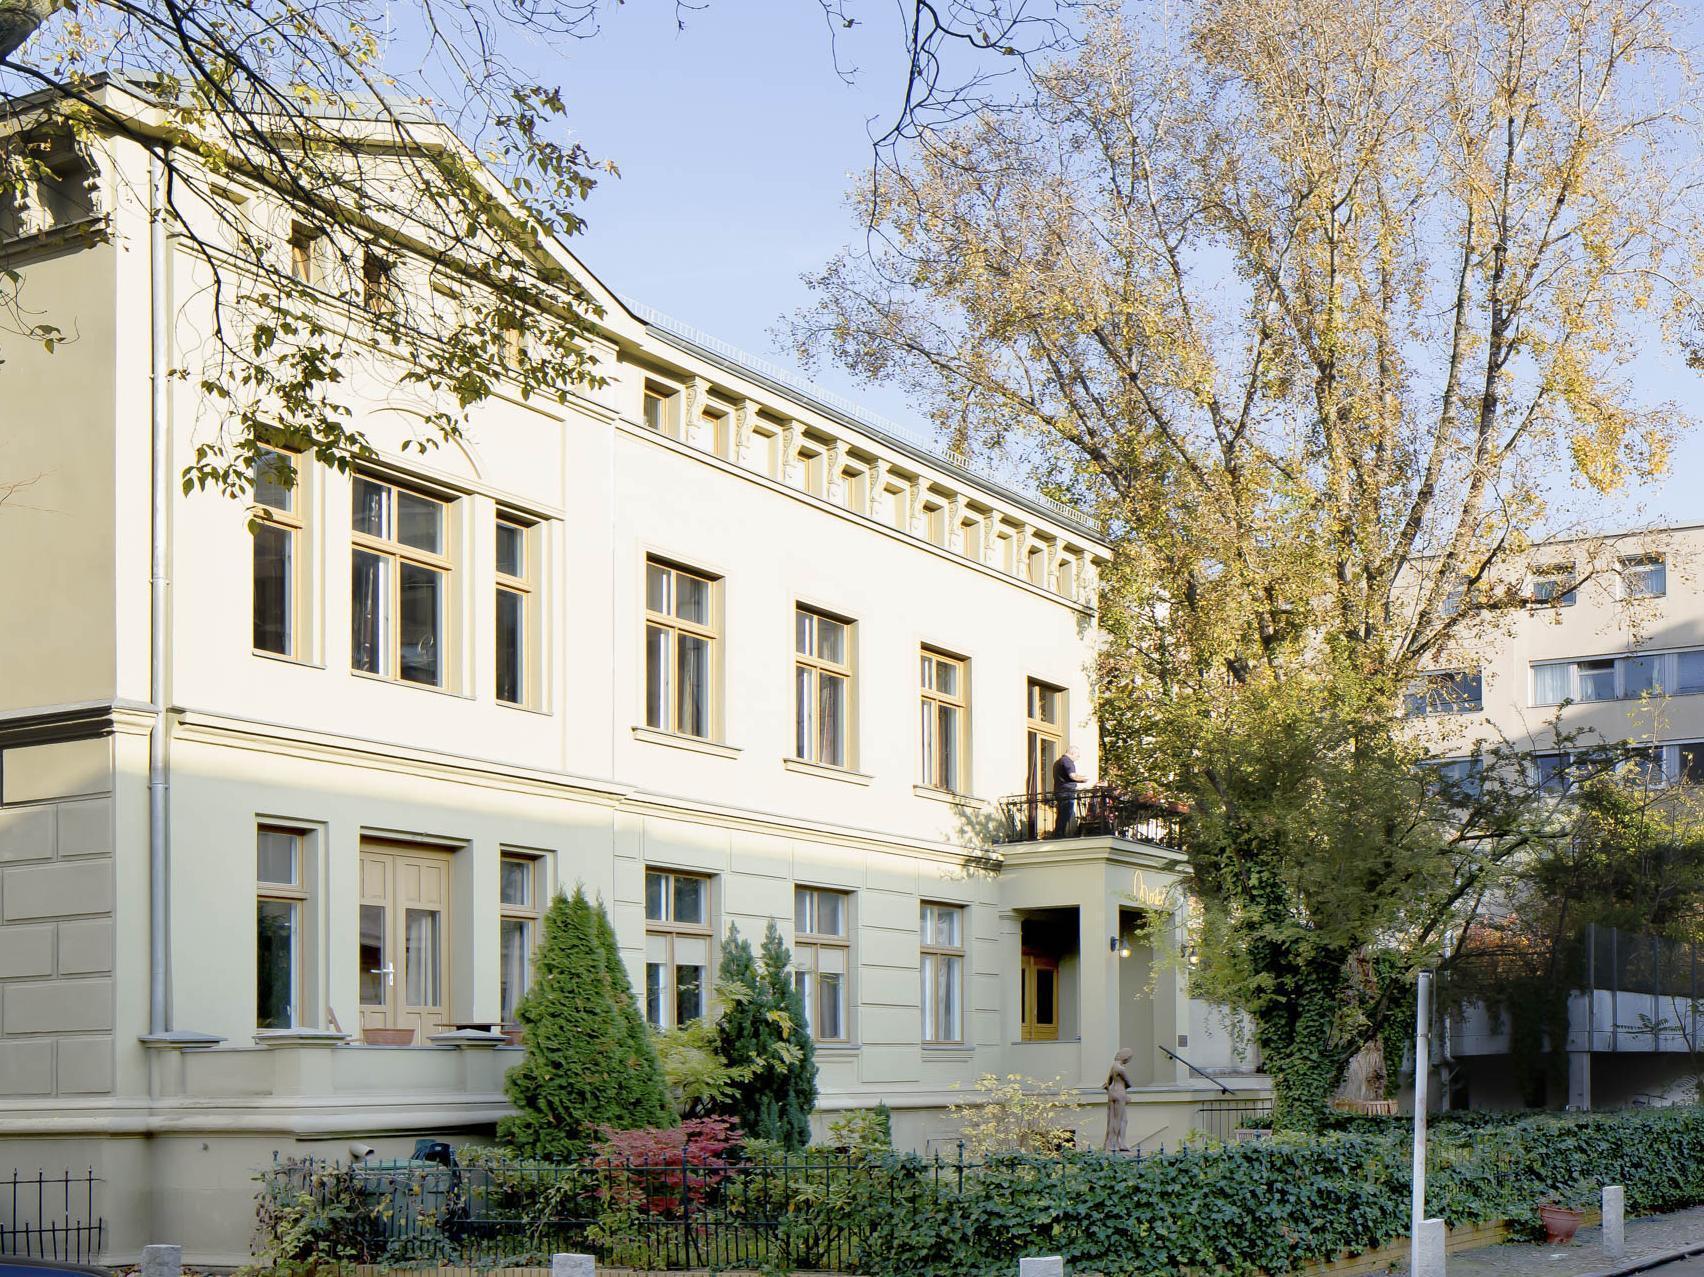 Hotel Residenz Begaswinkel - Hotell och Boende i Tyskland i Europa